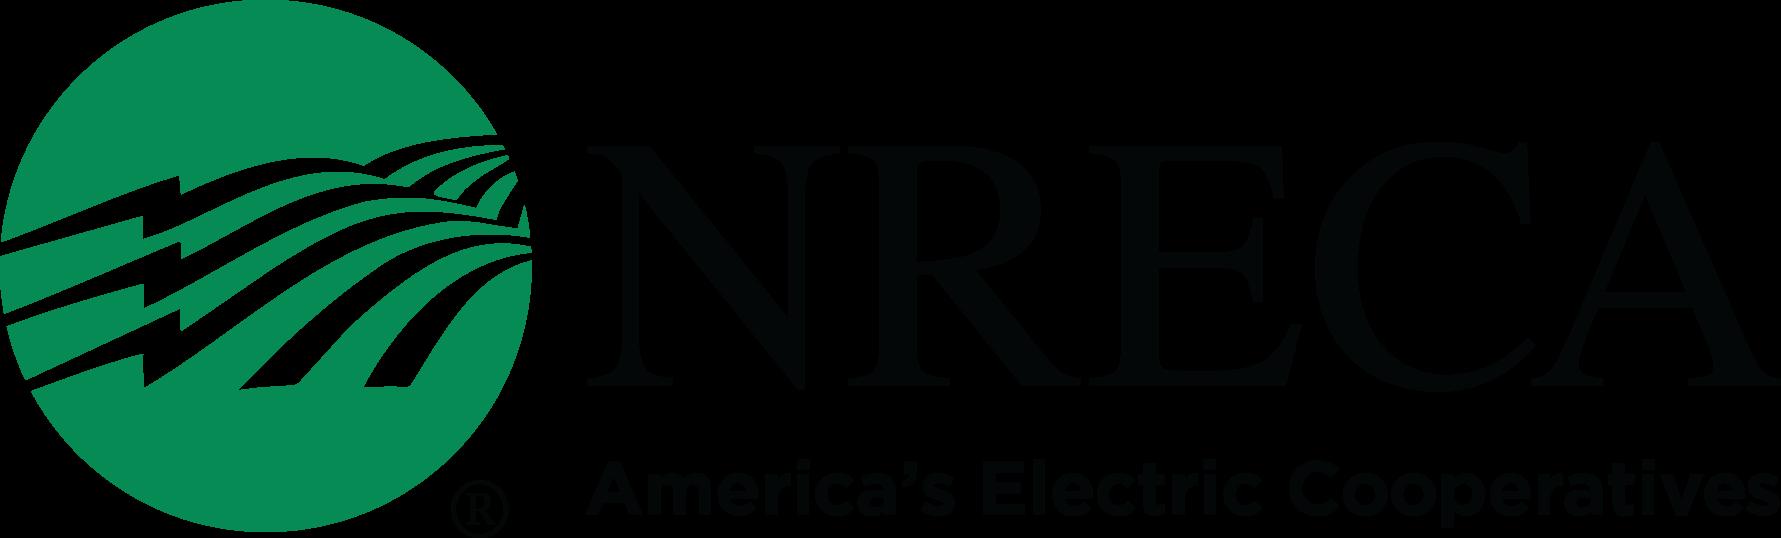 National Rural Electric Cooperative Association logo